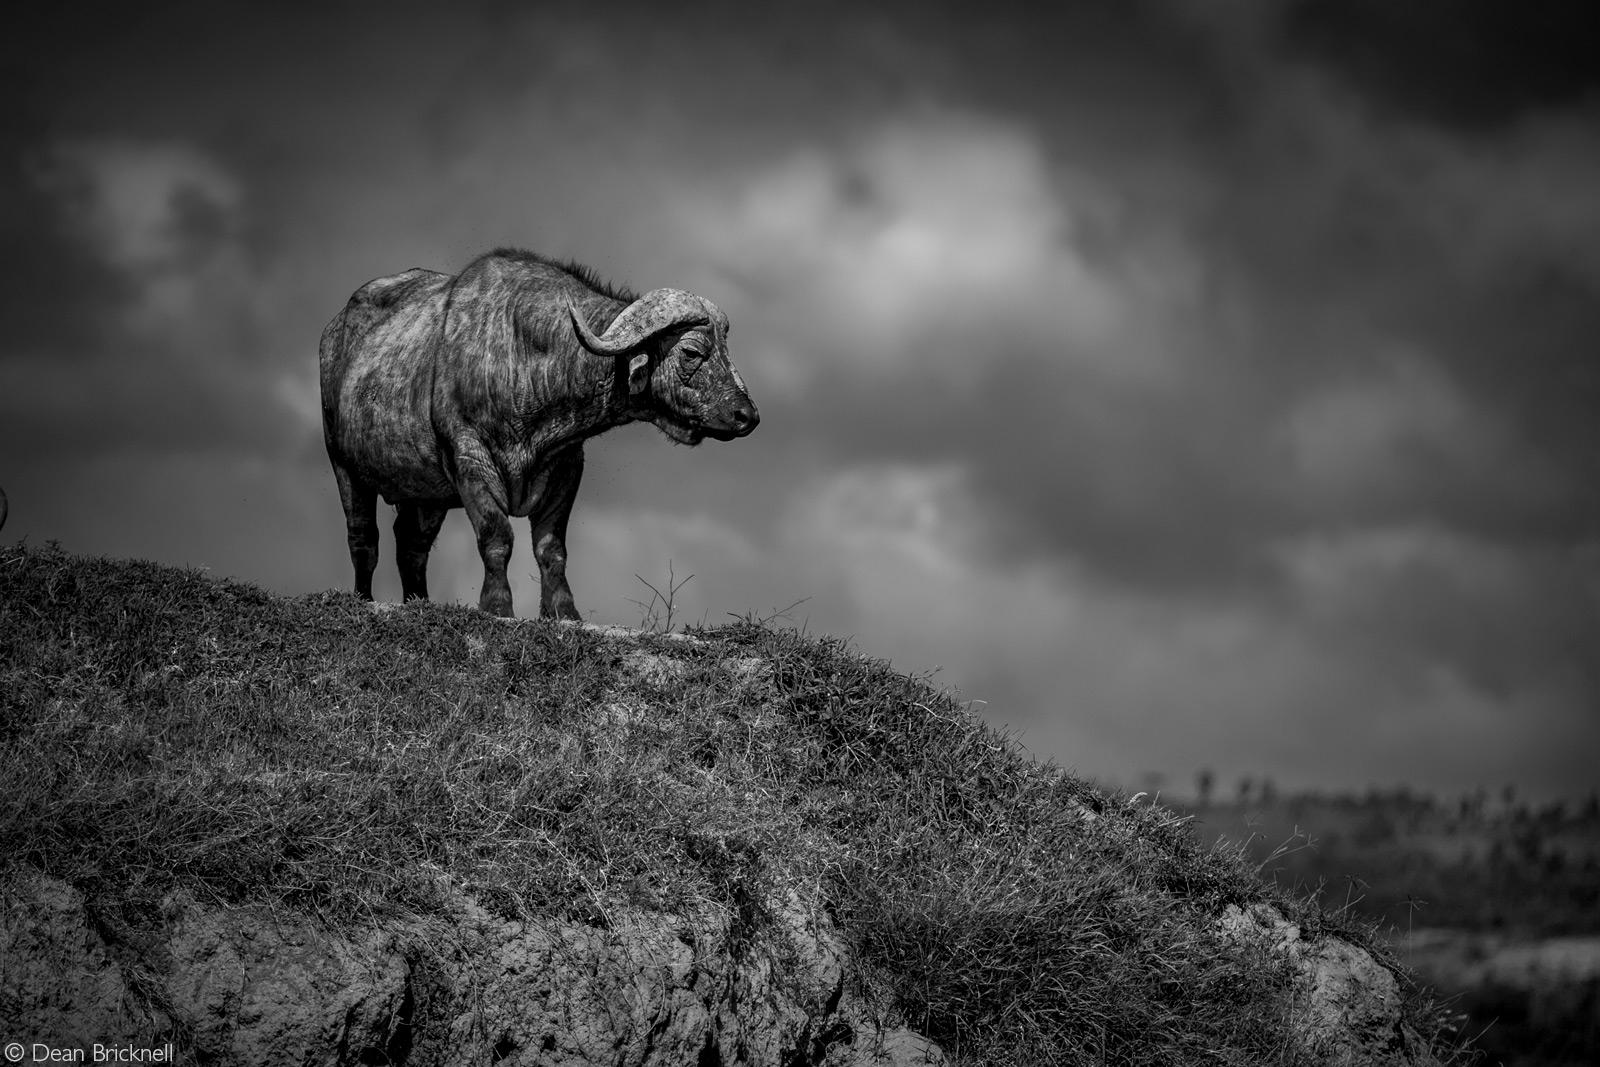 Cape buffalo on the look out. Lake Nakuru National Park, Kenya © Dean Bricknell